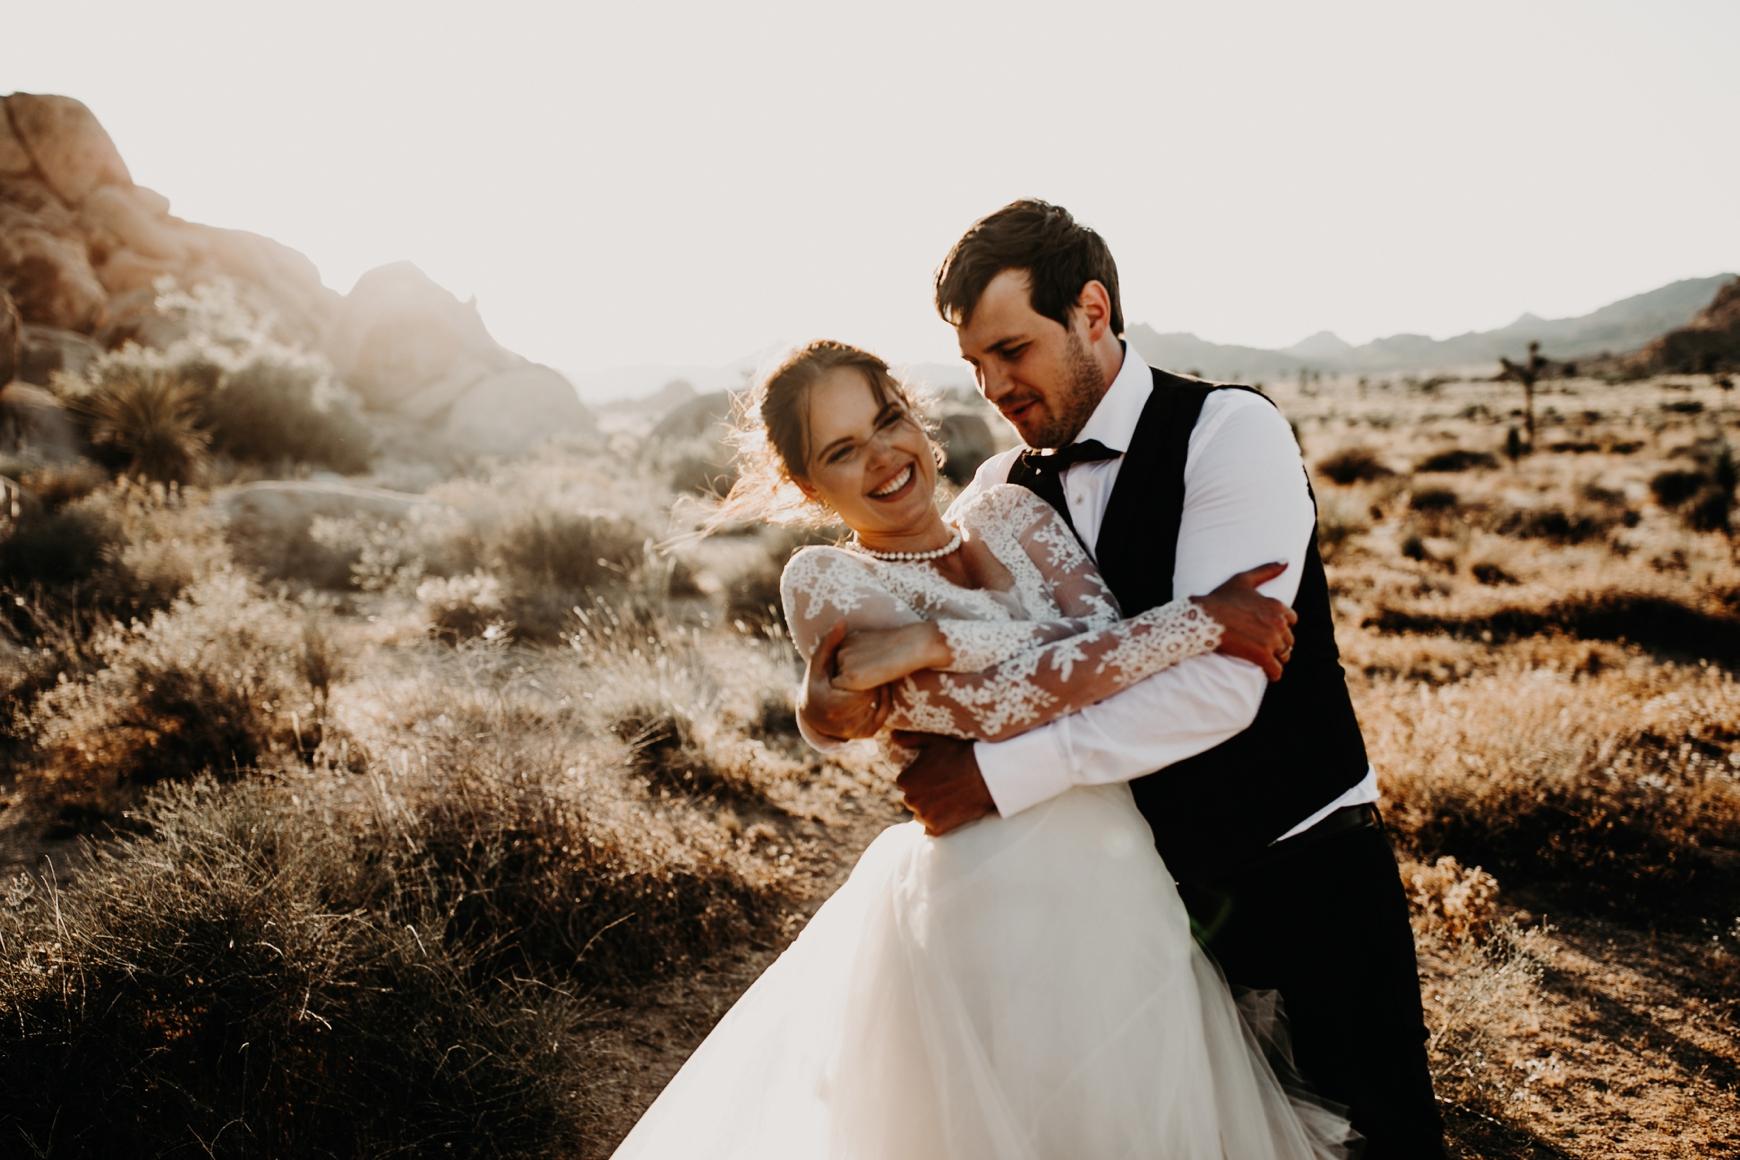 Joshua Tree Bridal Portraits Anastasia & Andrey Emily Magers Photography-177.jpg